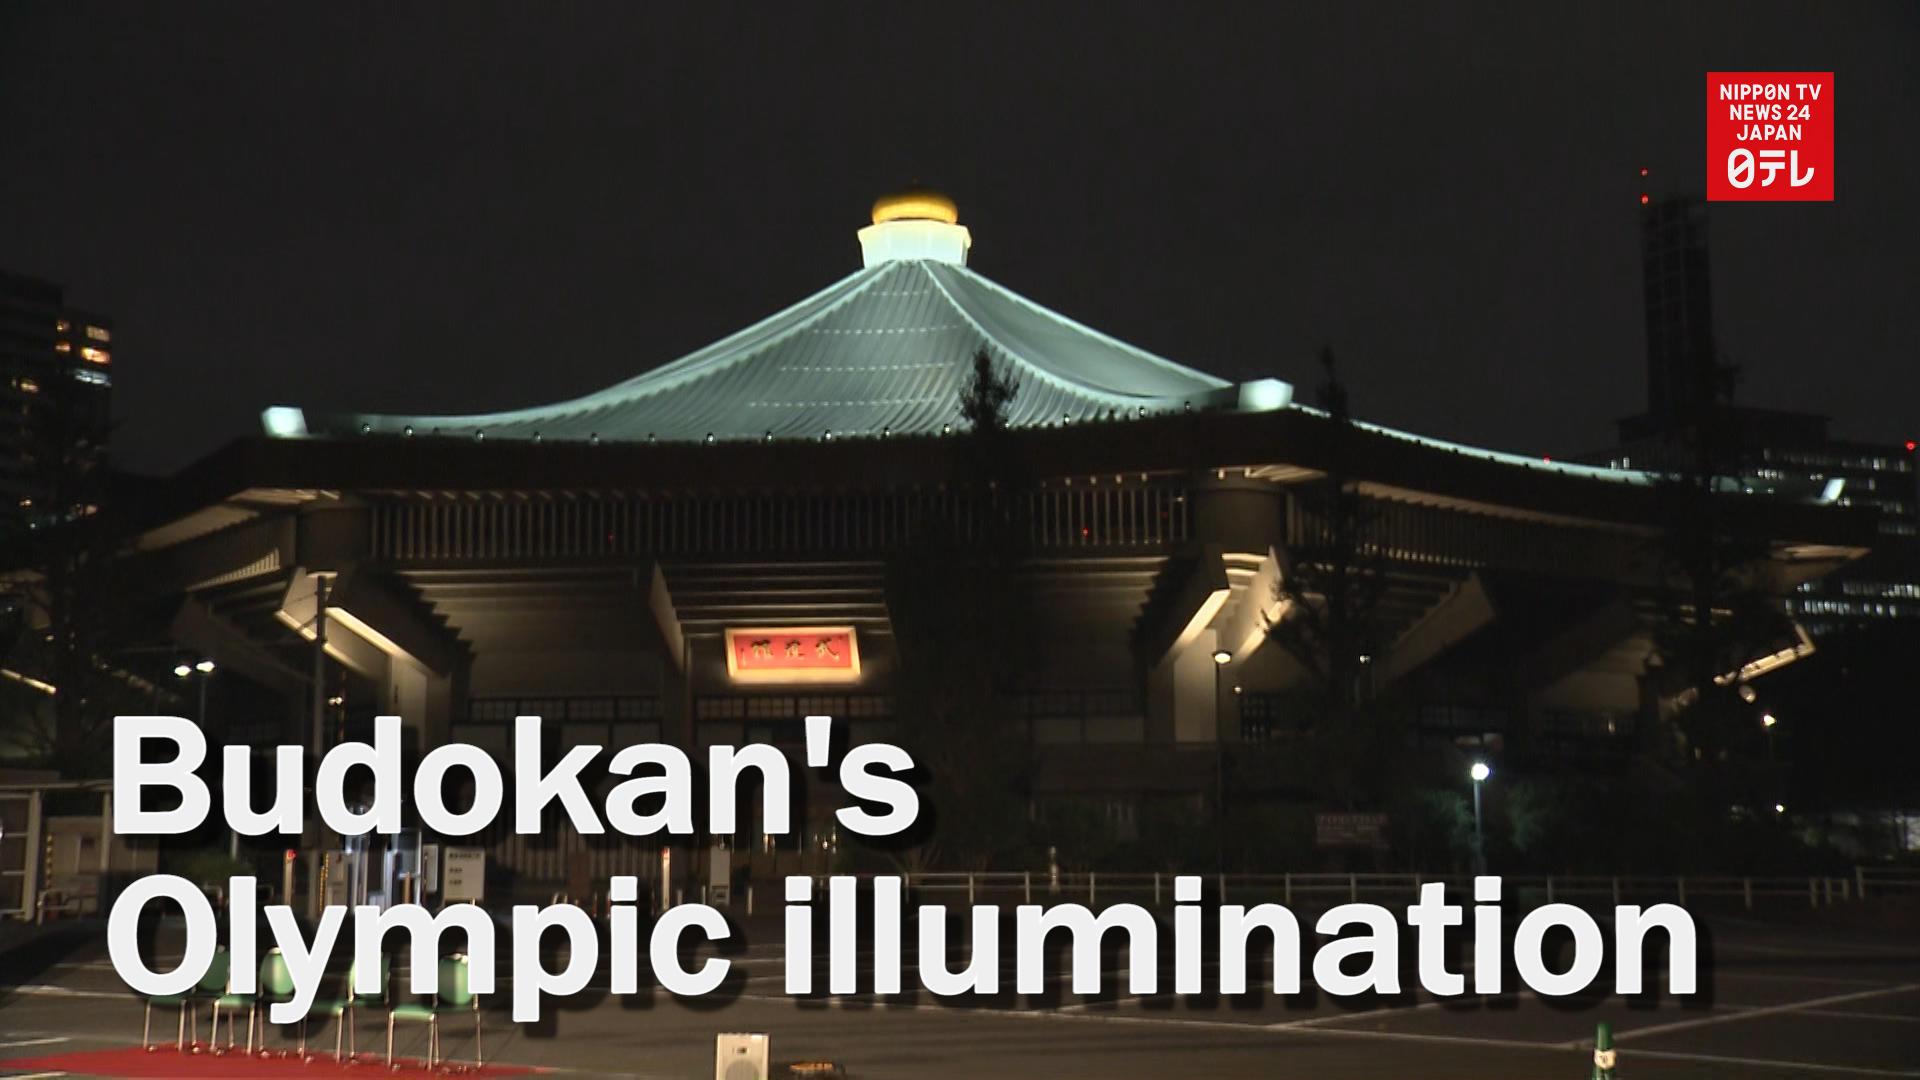 Budokan gets Olympic illumination